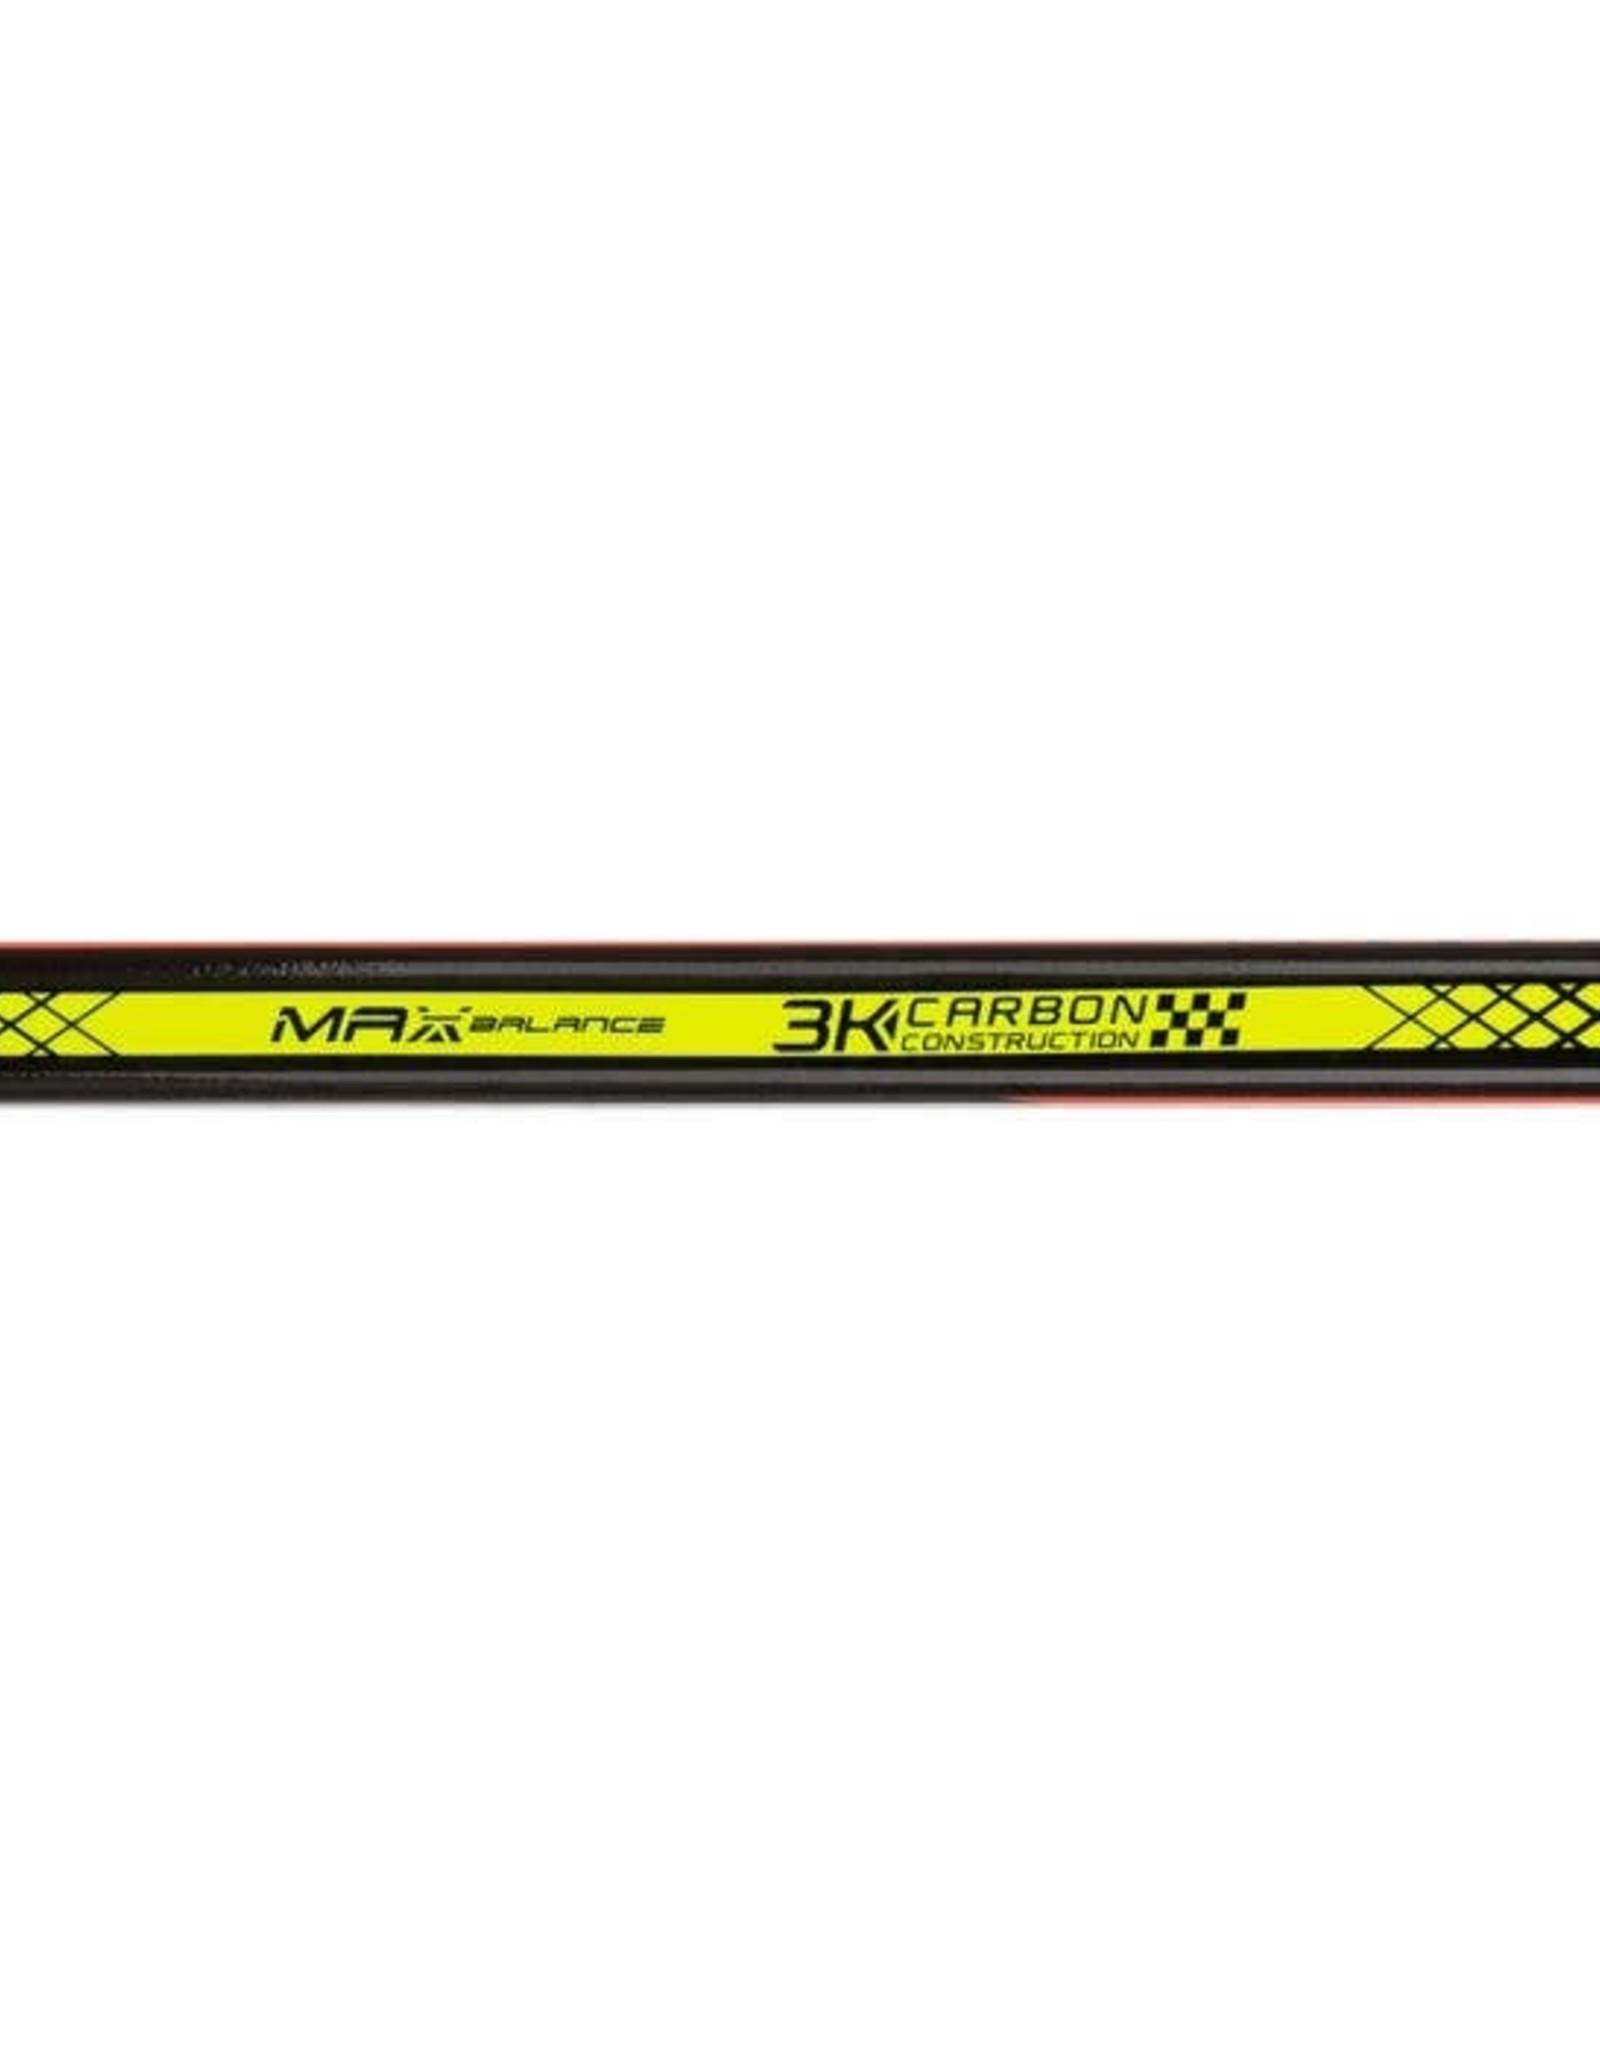 Bauer Hockey S19 VAPOR 2X TEAM GRIP STICK